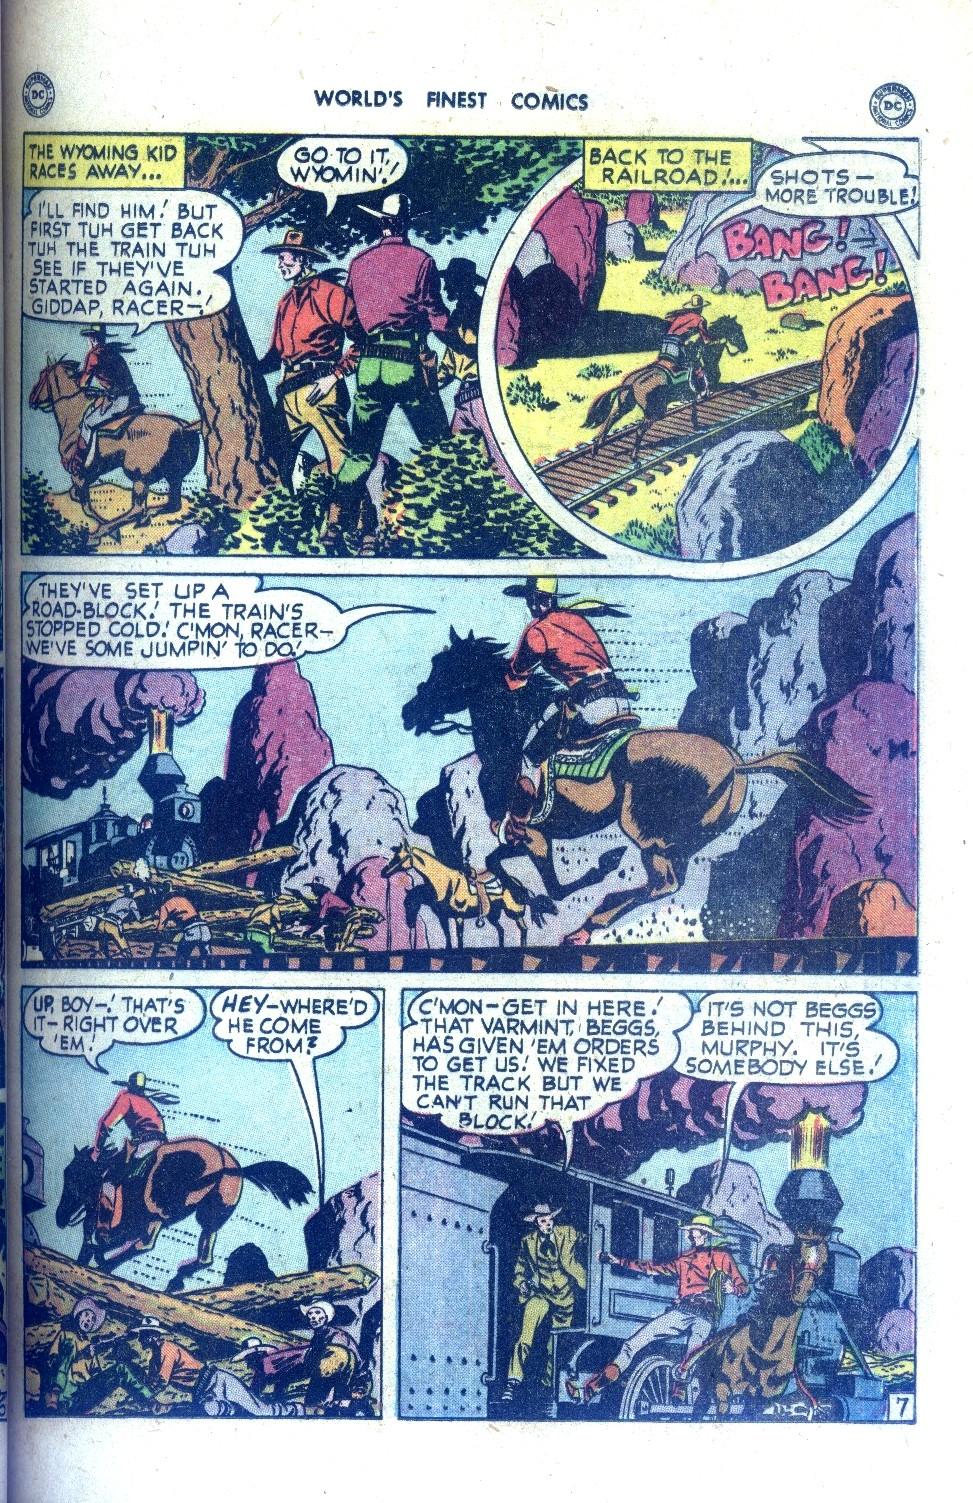 Read online World's Finest Comics comic -  Issue #43 - 23